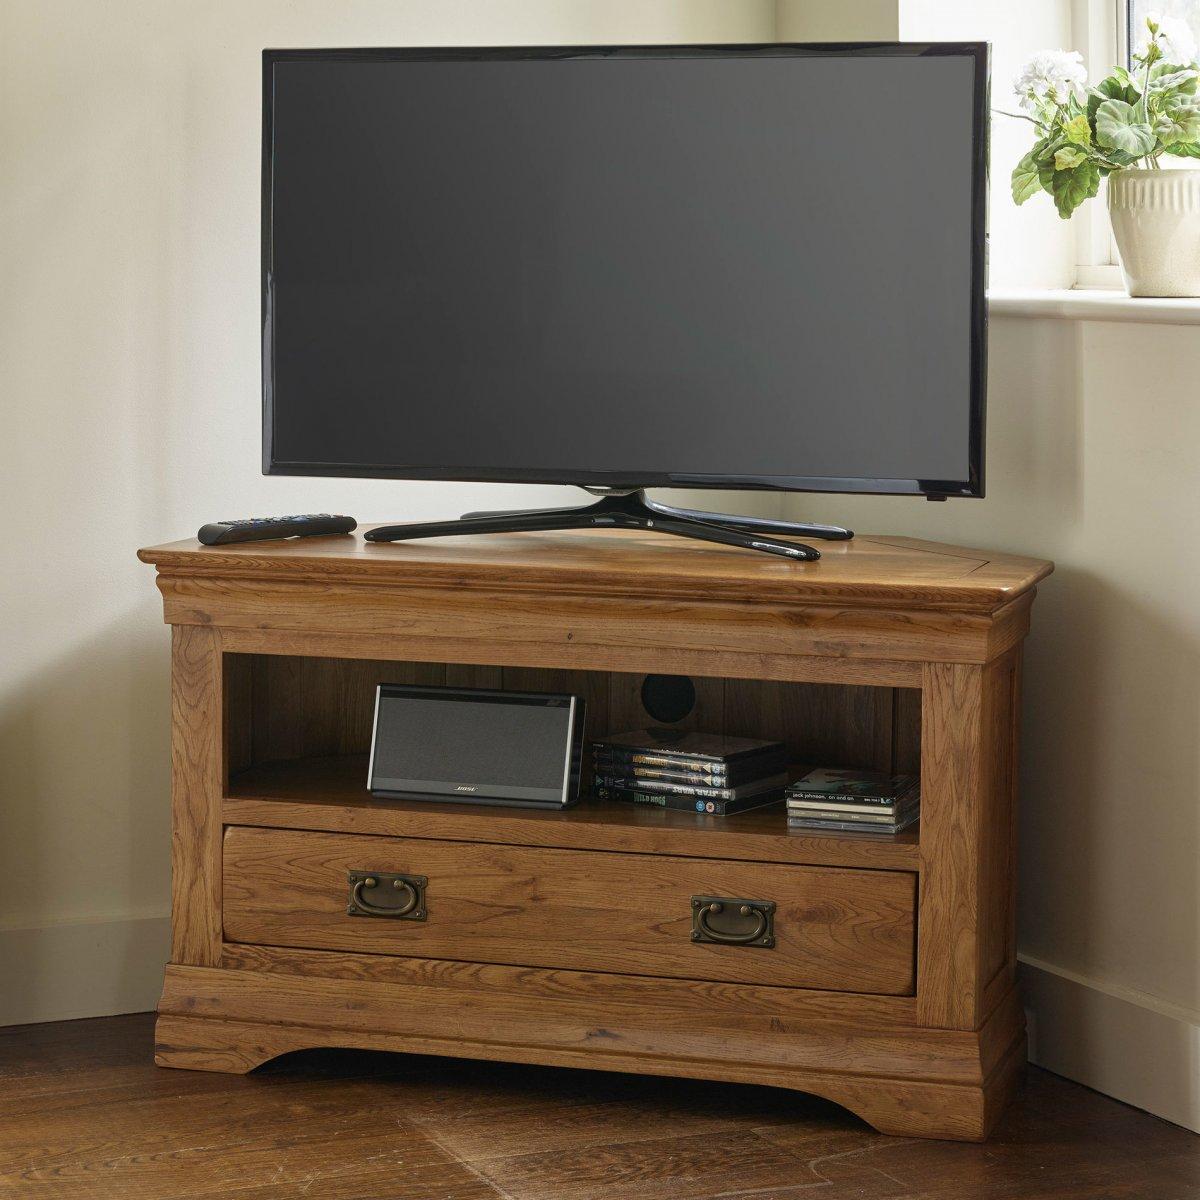 Living Room Furniture For Corner Cabinet: French Farmhouse Corner TV Unit